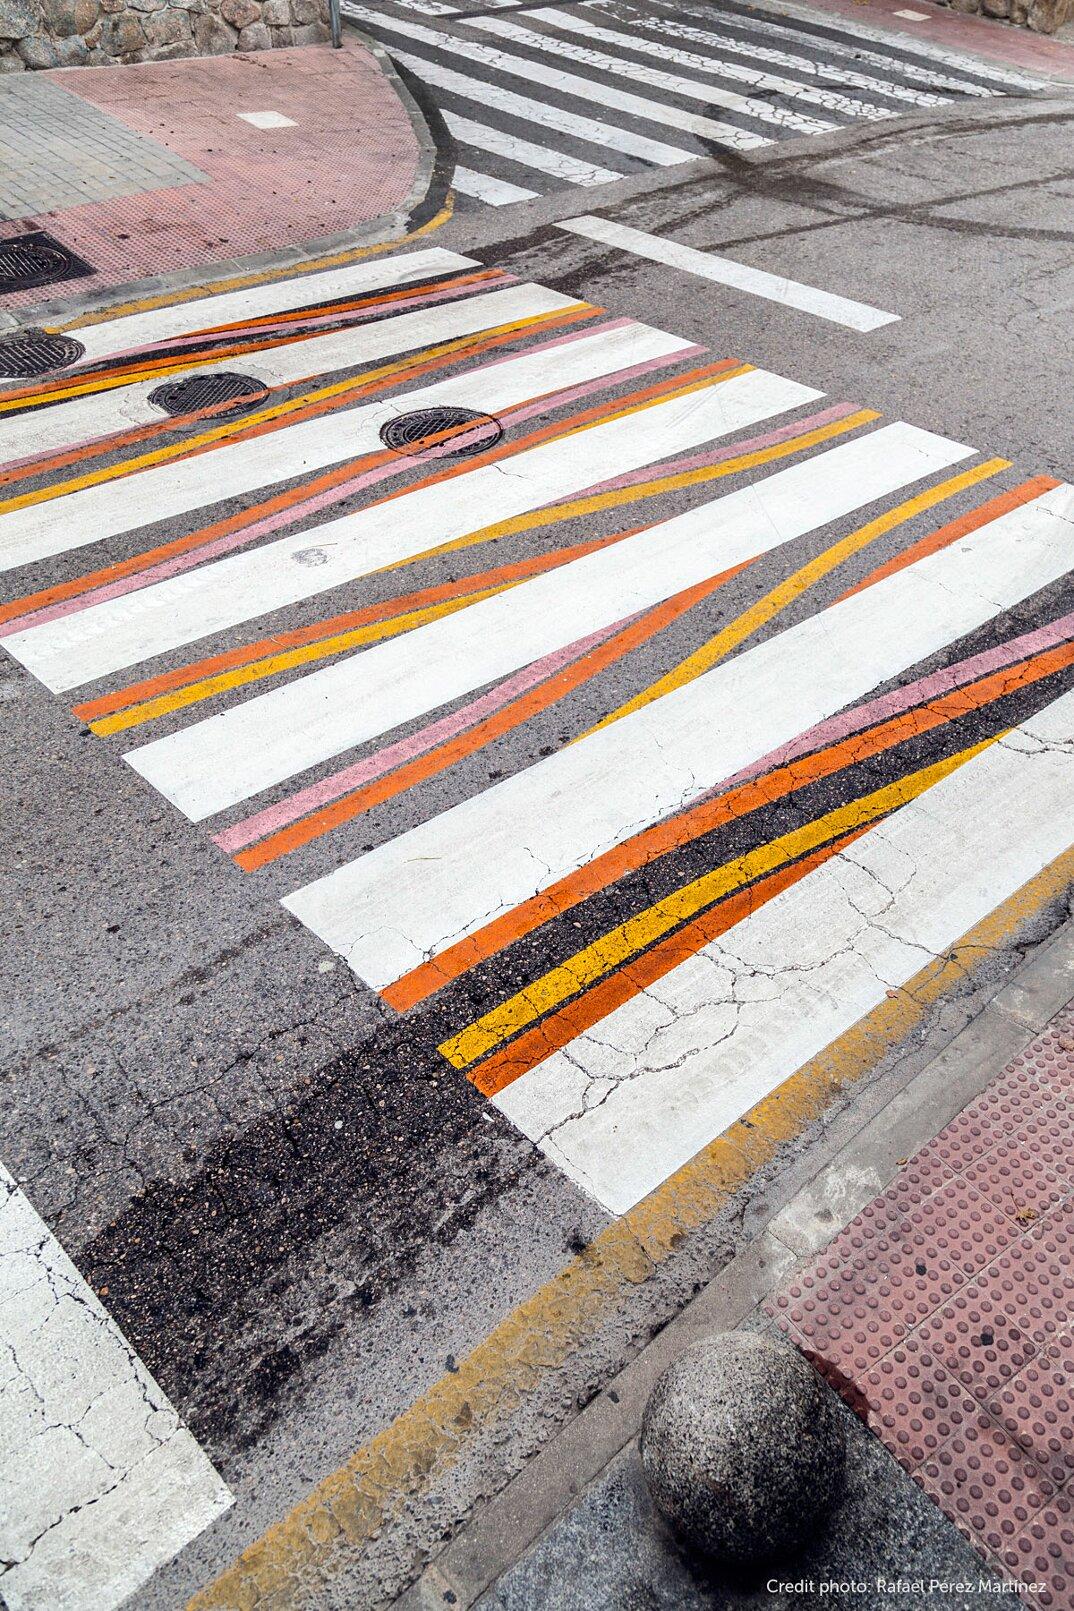 strisce-pedonali-decorate-arte-christo-guelov-funnycross-madrid-19